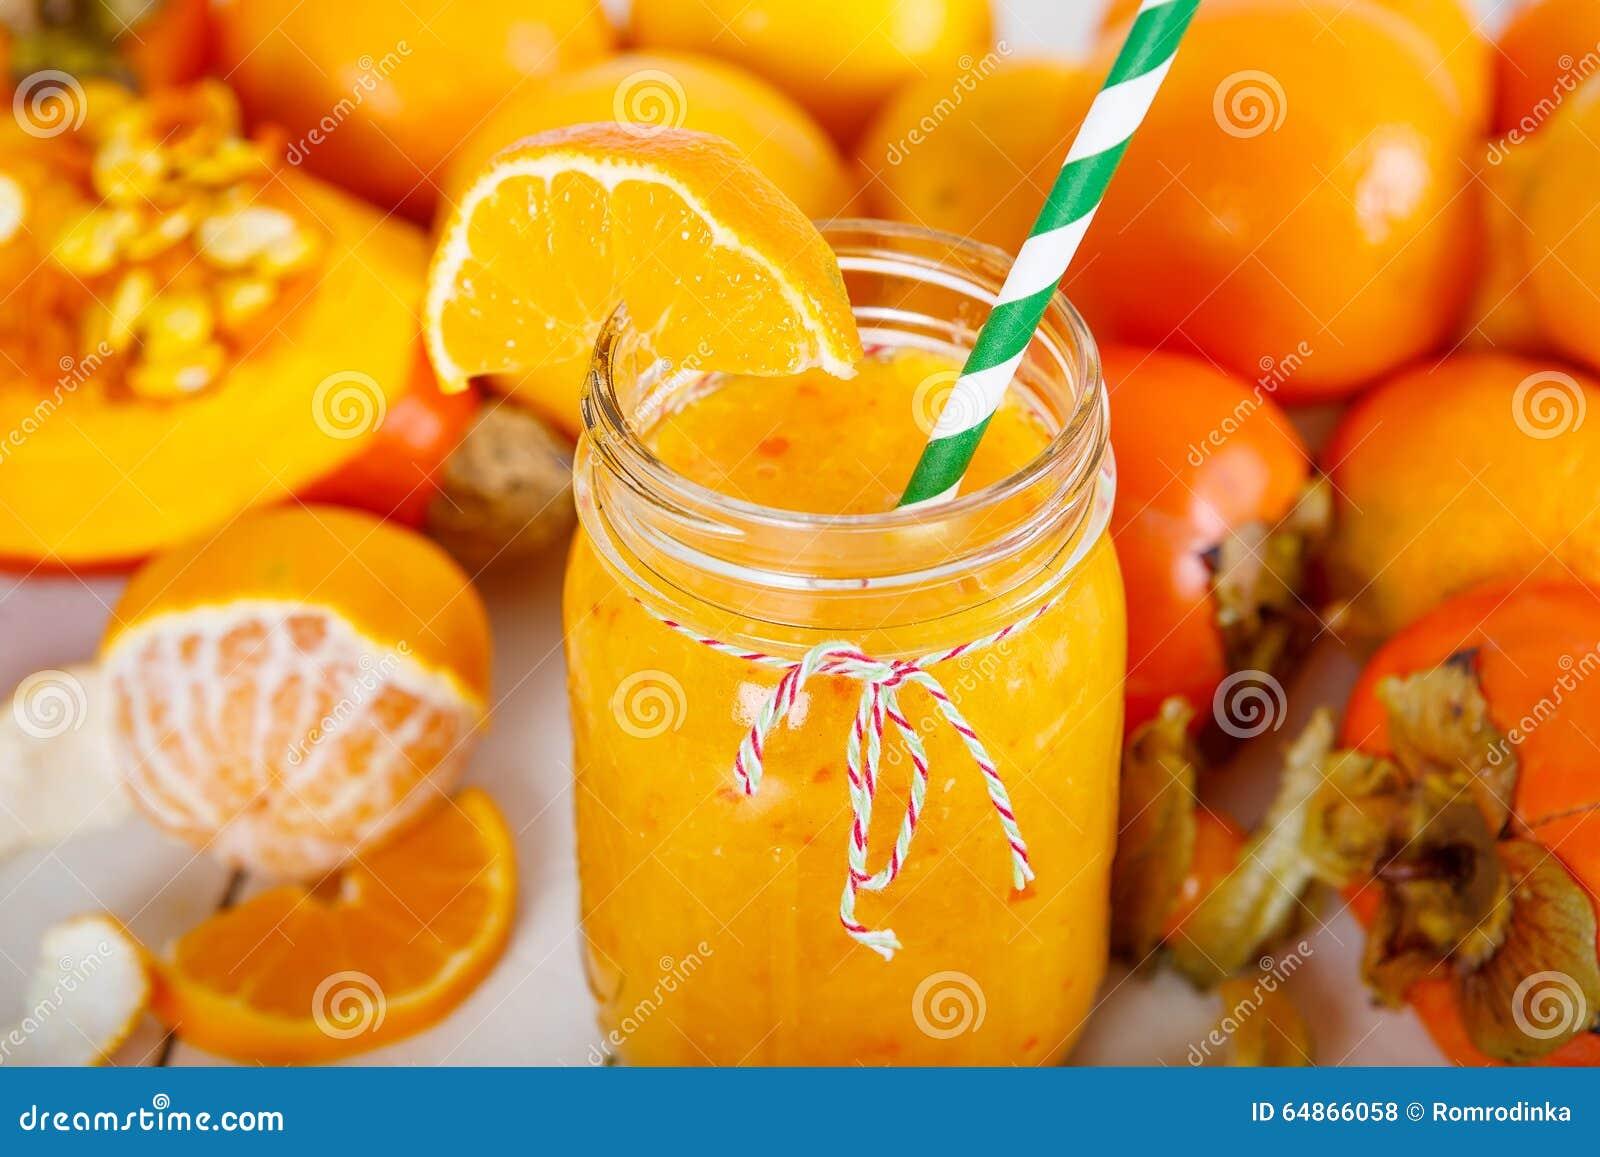 is pumpkin a fruit 5 healthy fruits